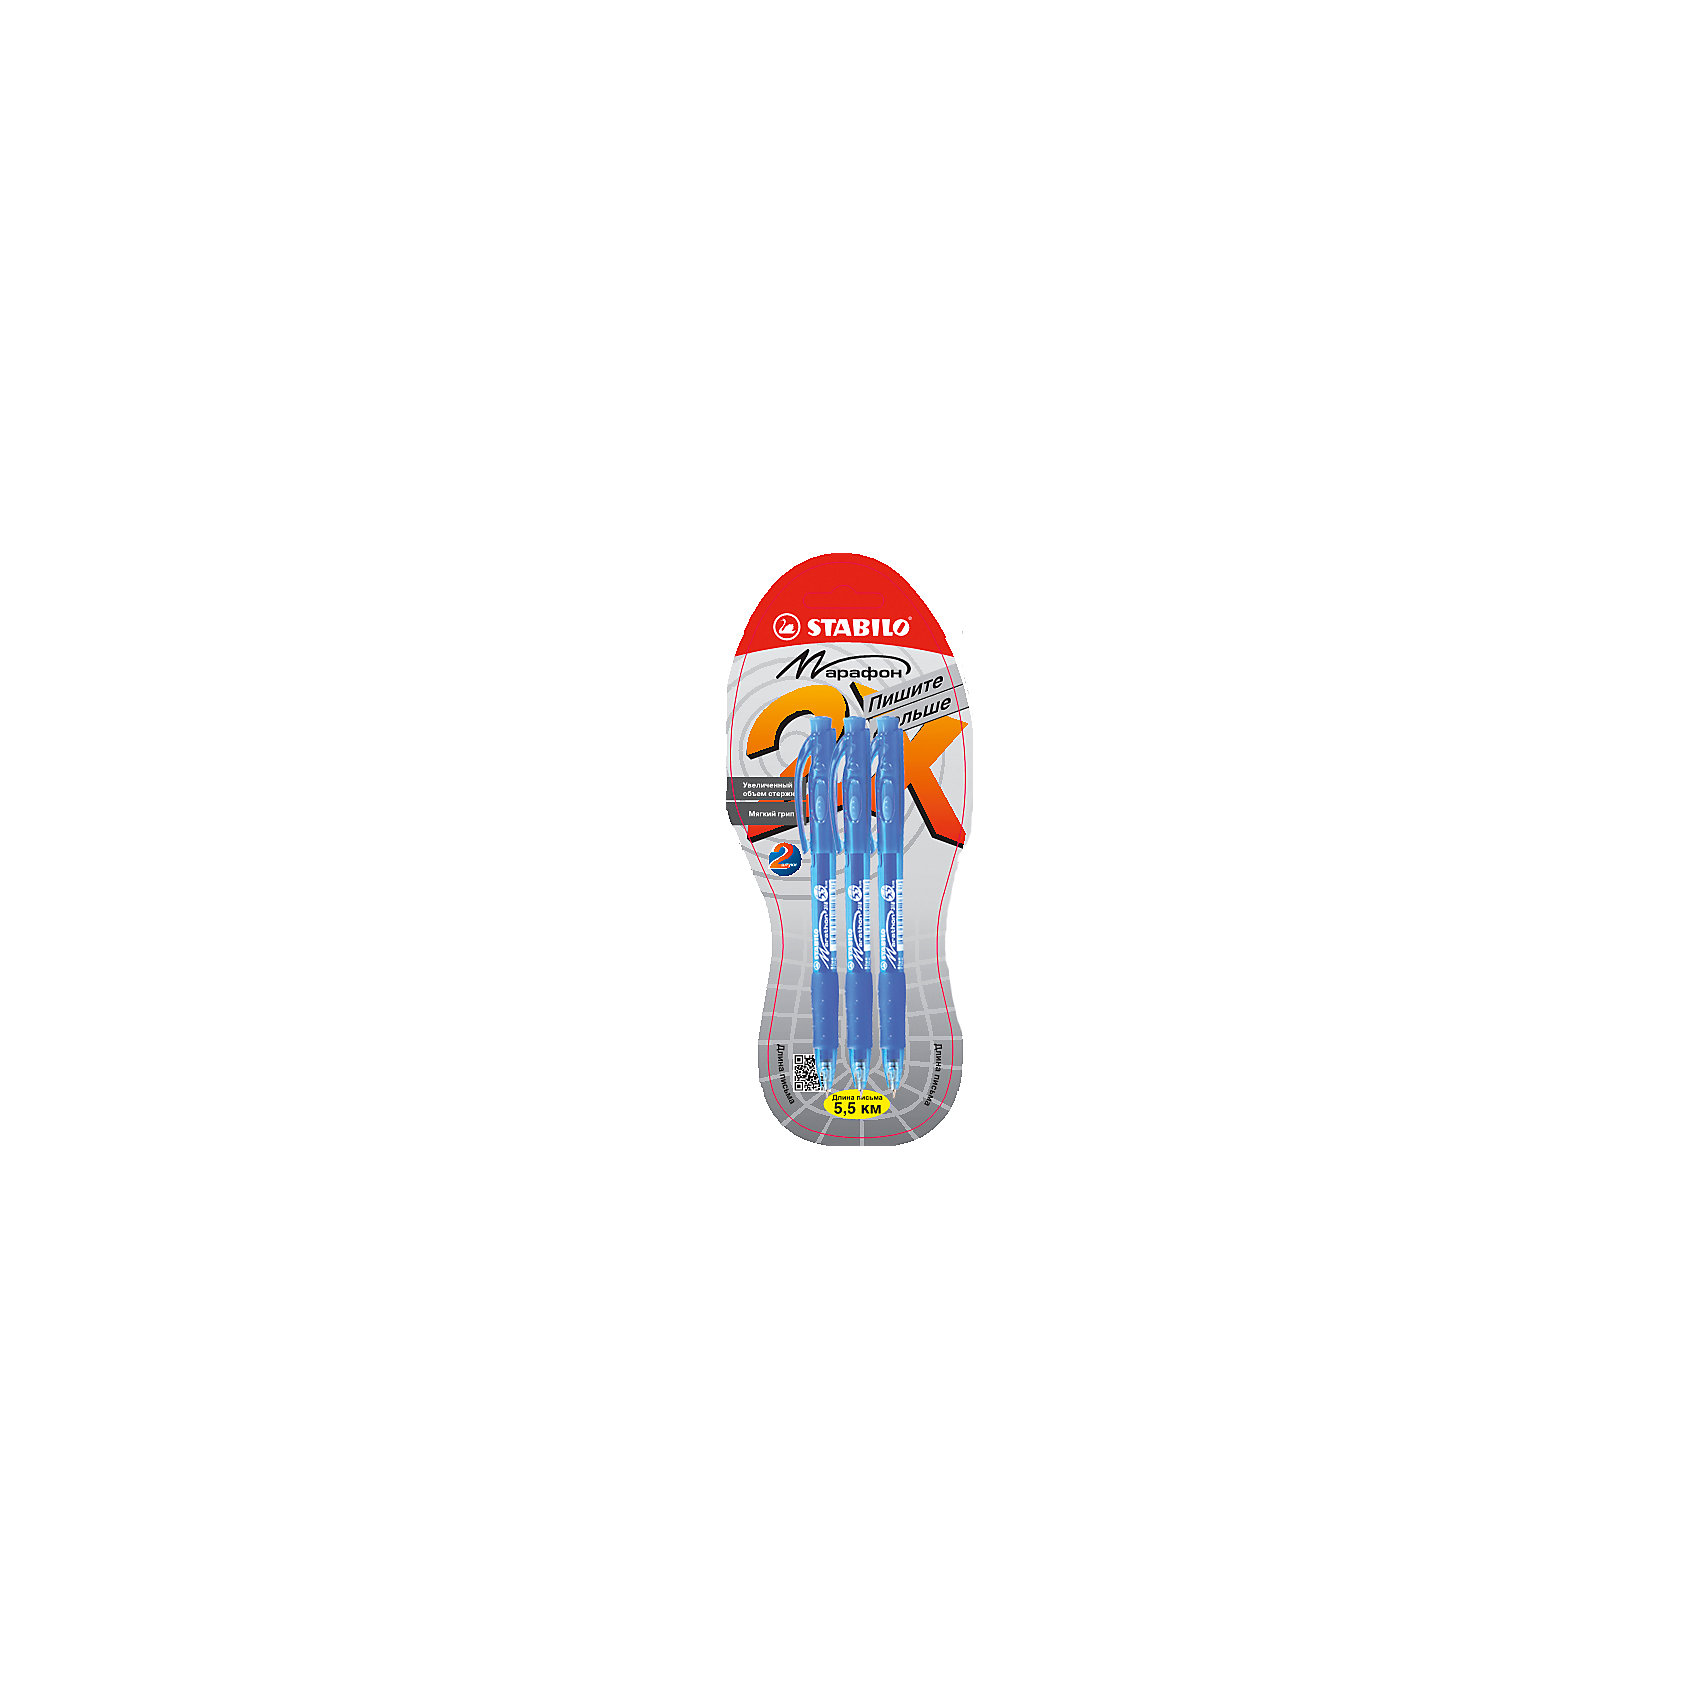 STABILO STABILO LeftRight Ручка шариковая marathon, синяя, 3шт. ручки stabilo ручка